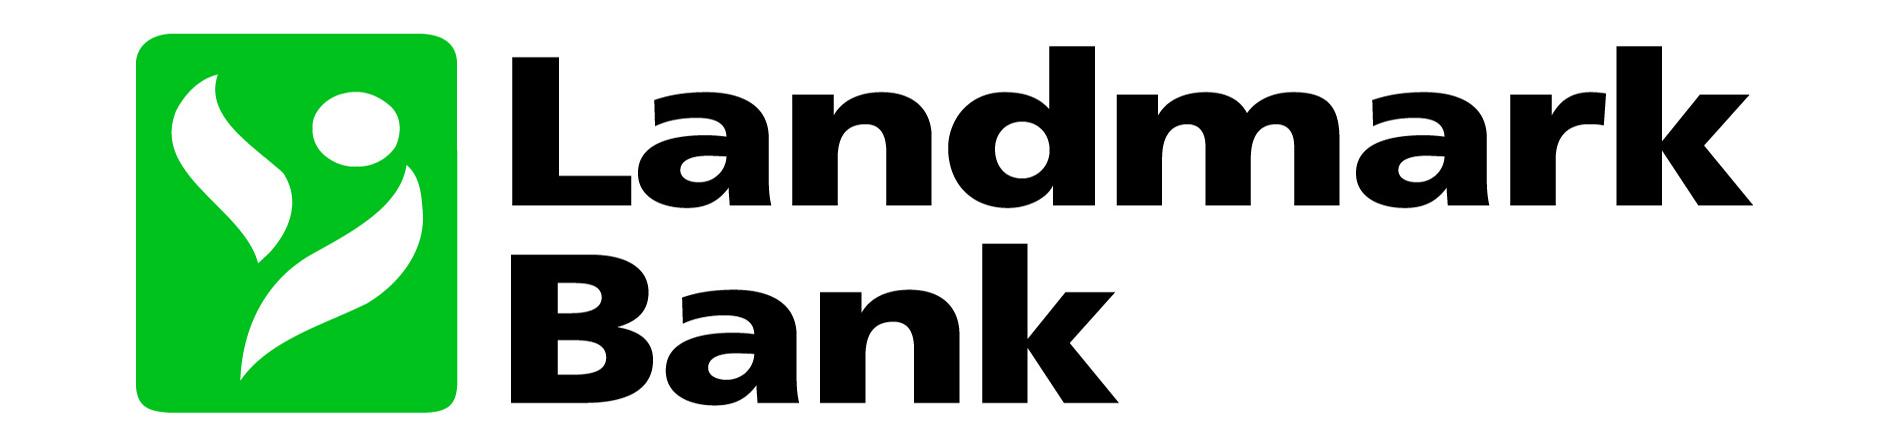 Landmark Bank logo.jpg